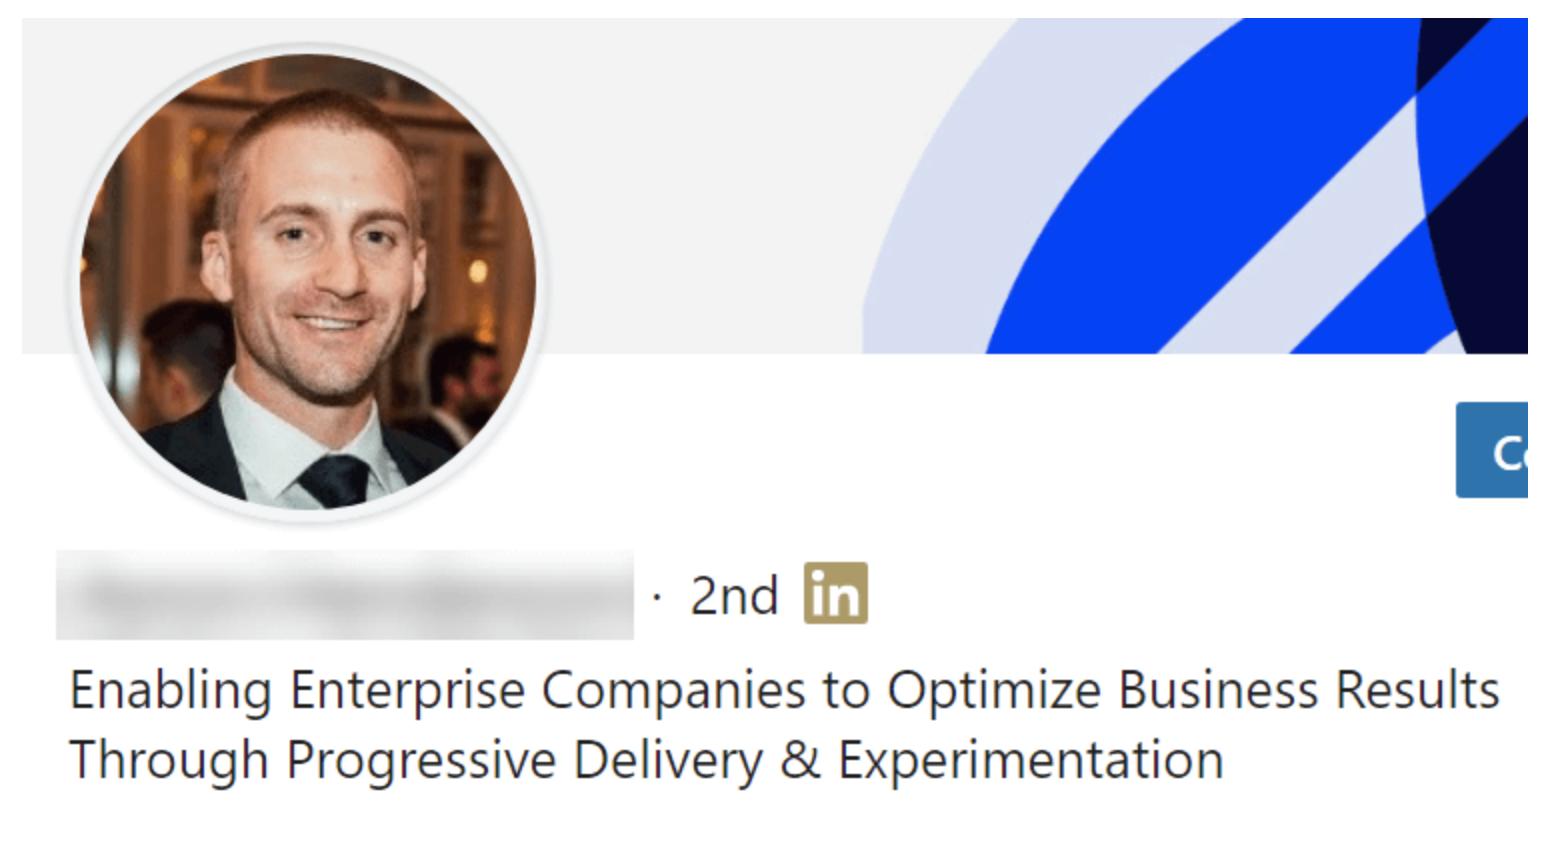 prospecting on LinkedIn - change your header